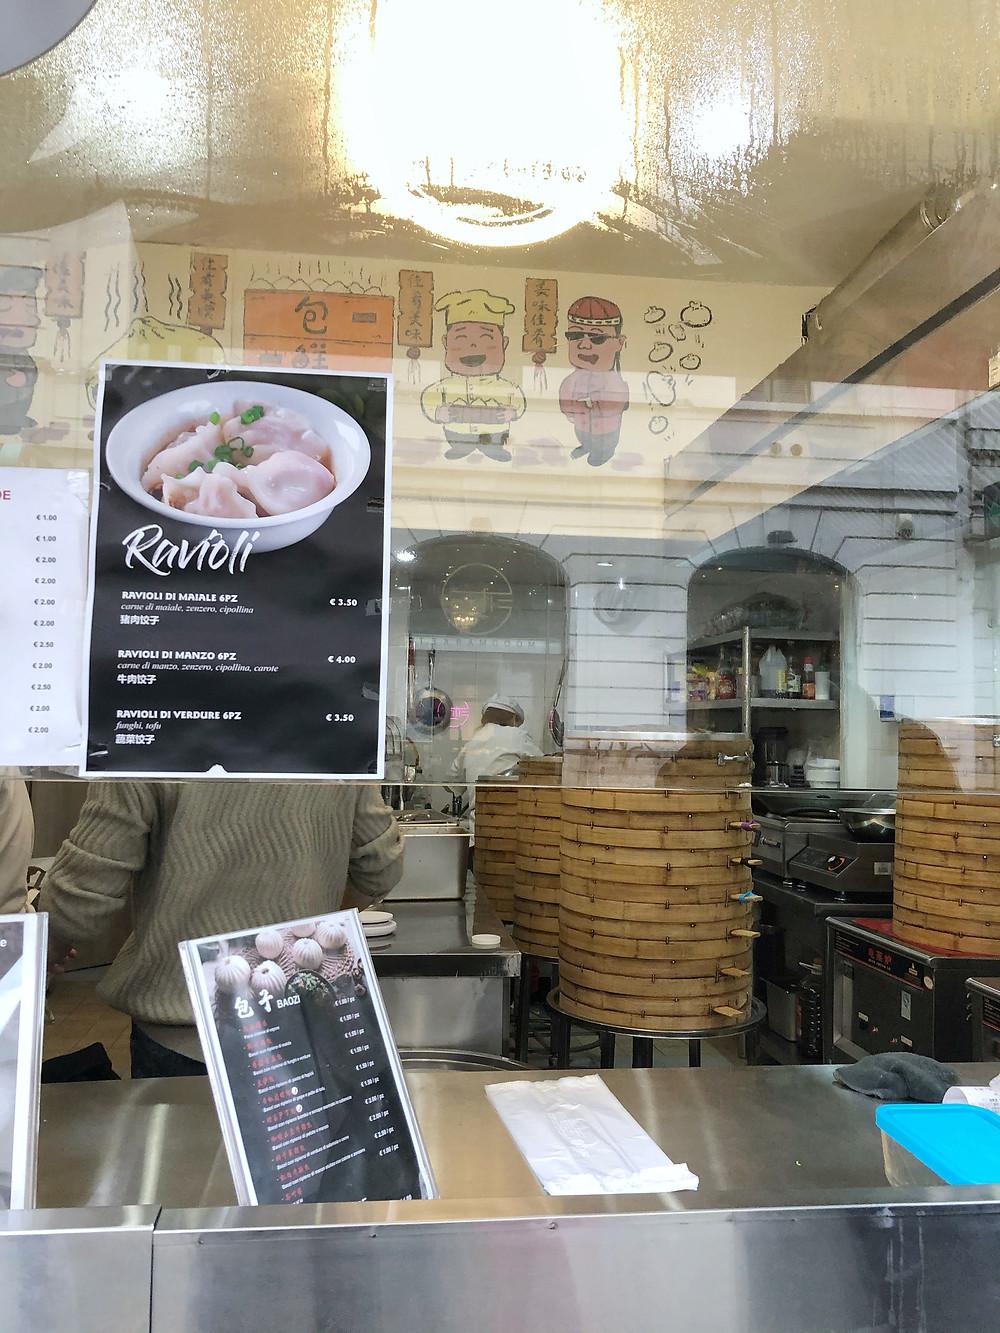 Baozi sarpi cookingwiththehamster